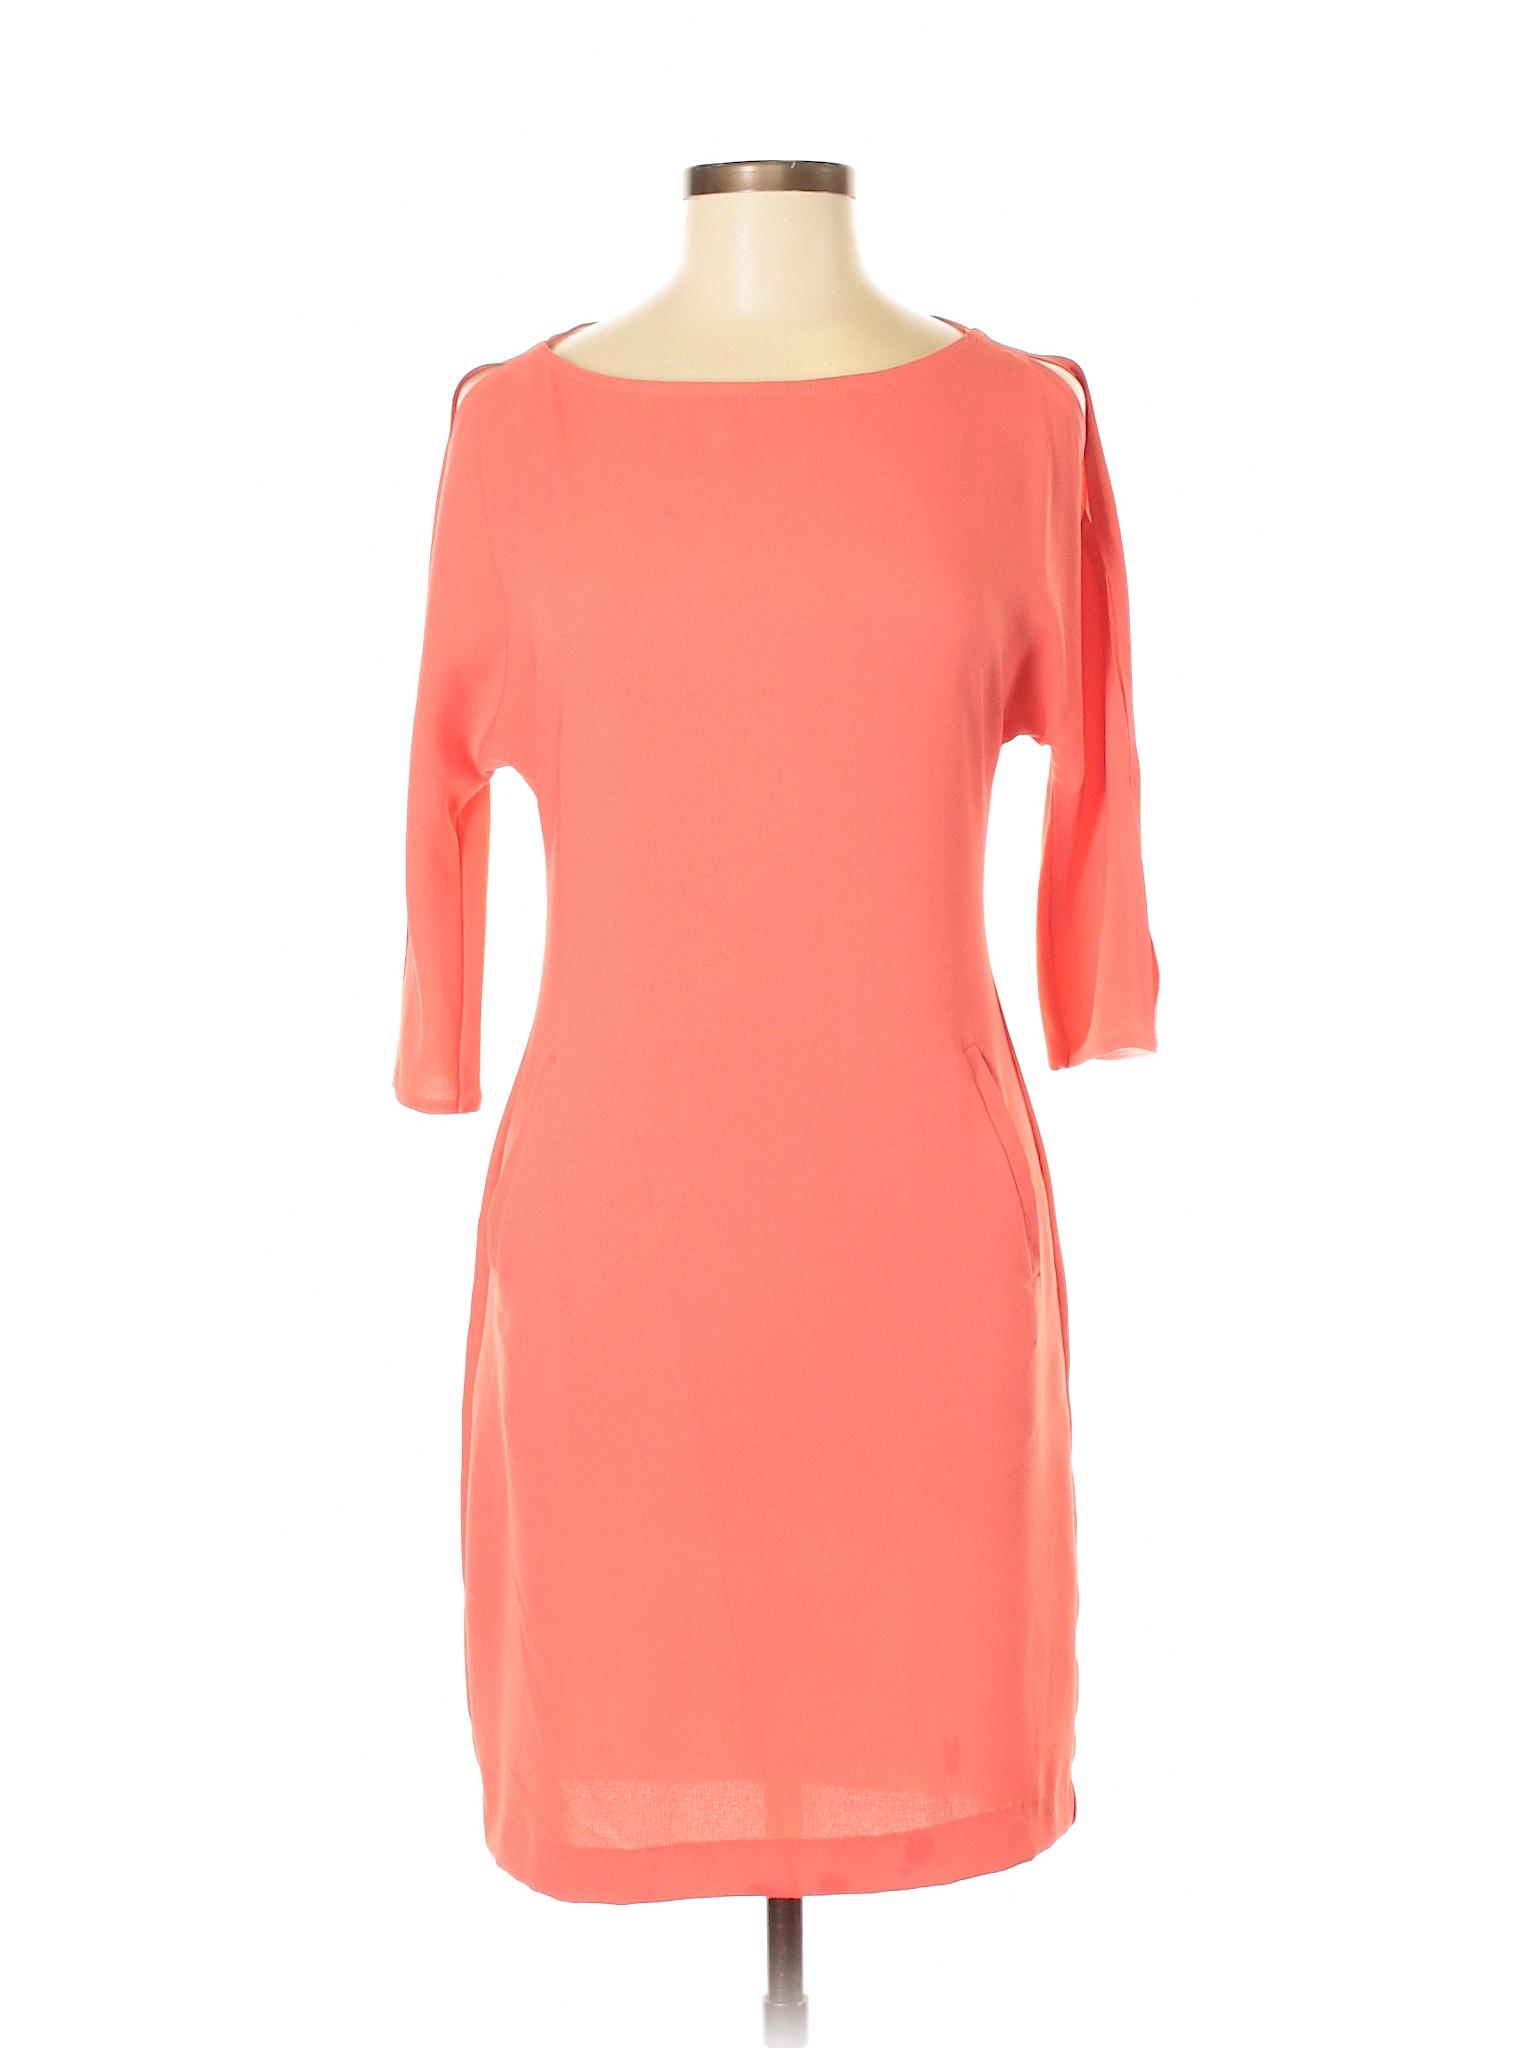 Esley Dress Esley Boutique Dress Casual Boutique Dress winter Esley Casual Boutique Casual winter winter wTgpxxq